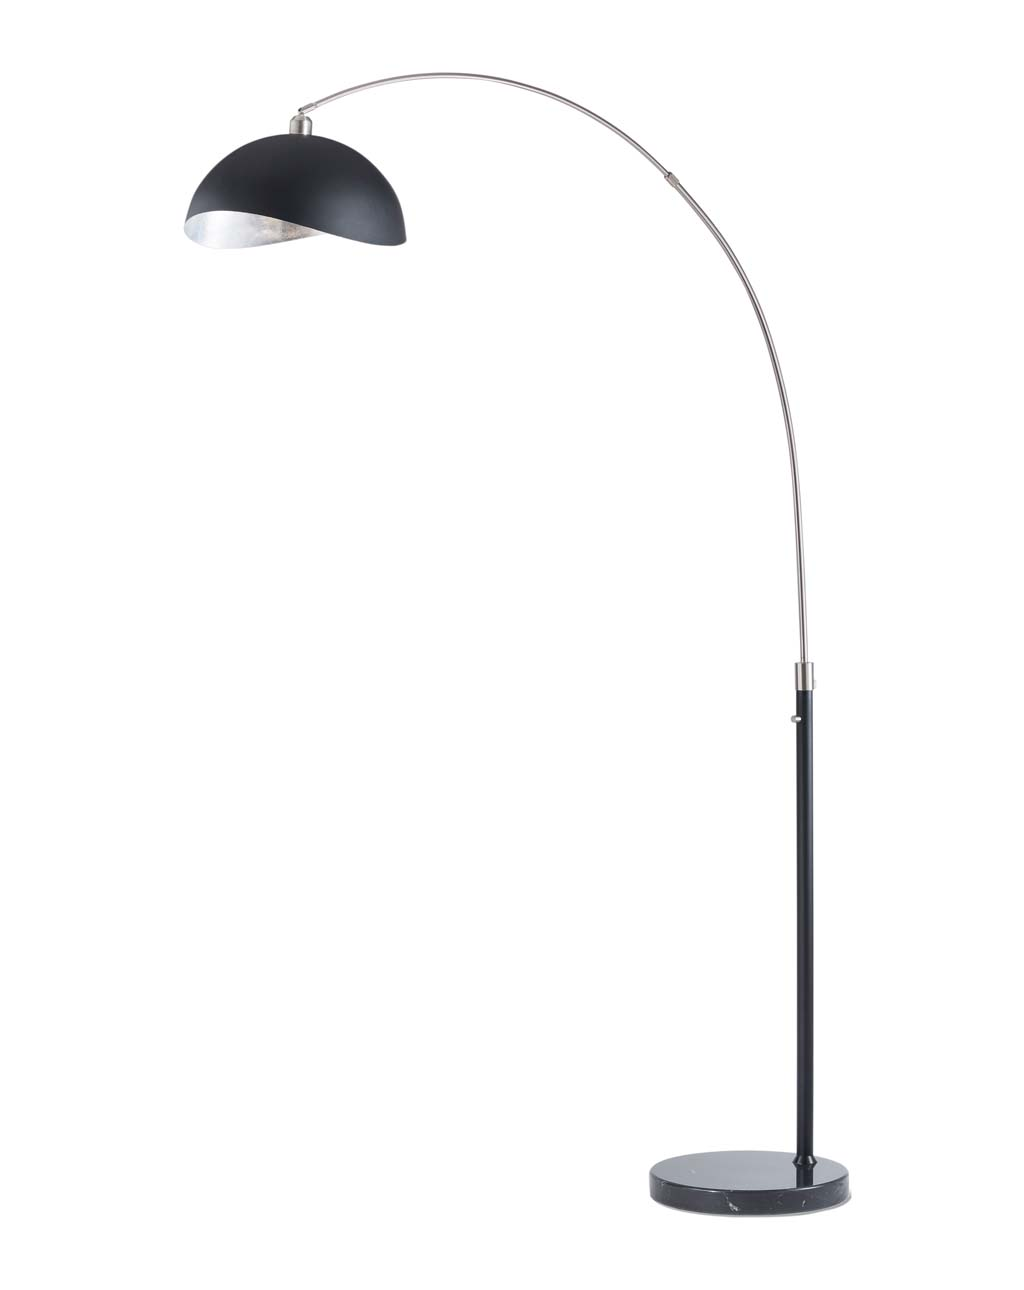 Luna Bella Arc Lamp, Brushed Nickel